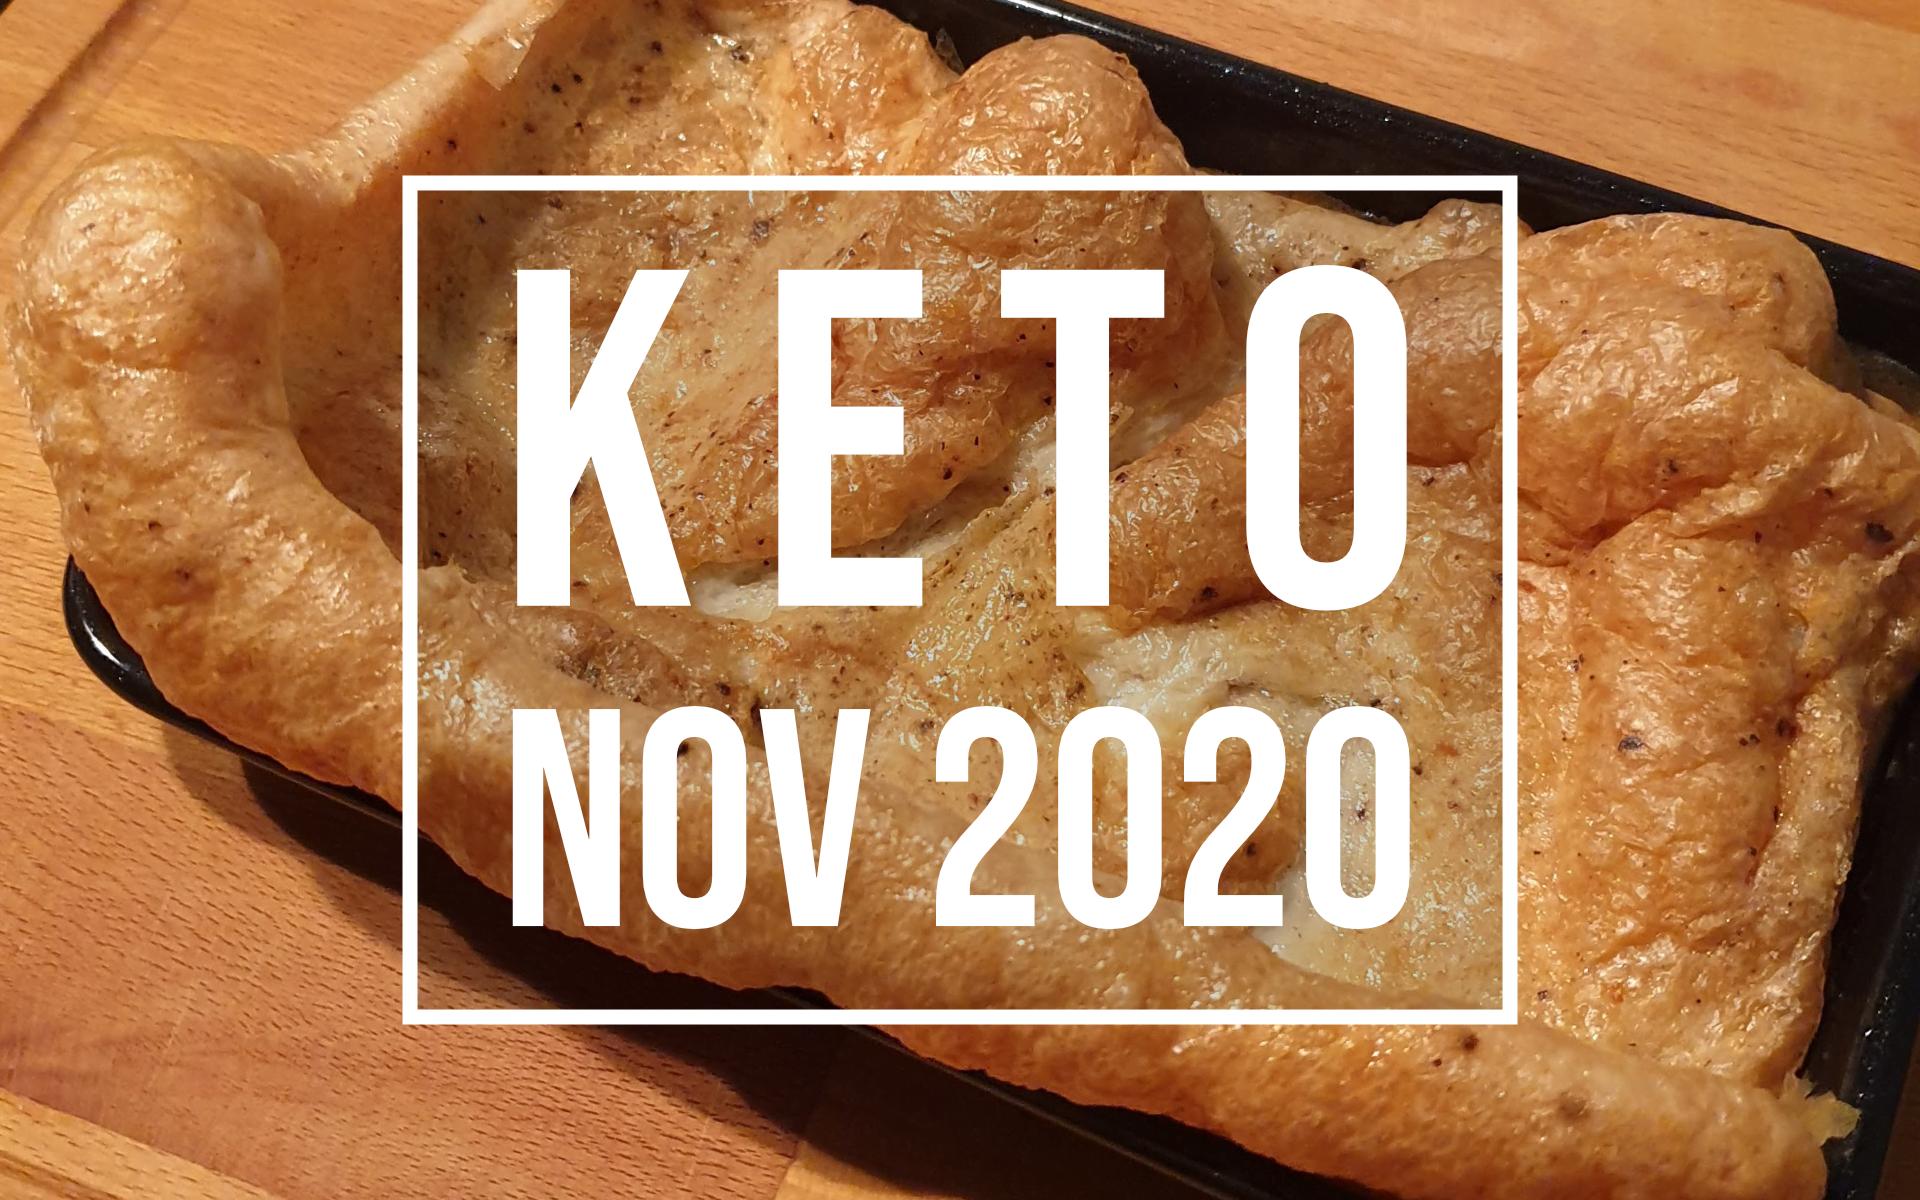 keto roundup Nov 2020